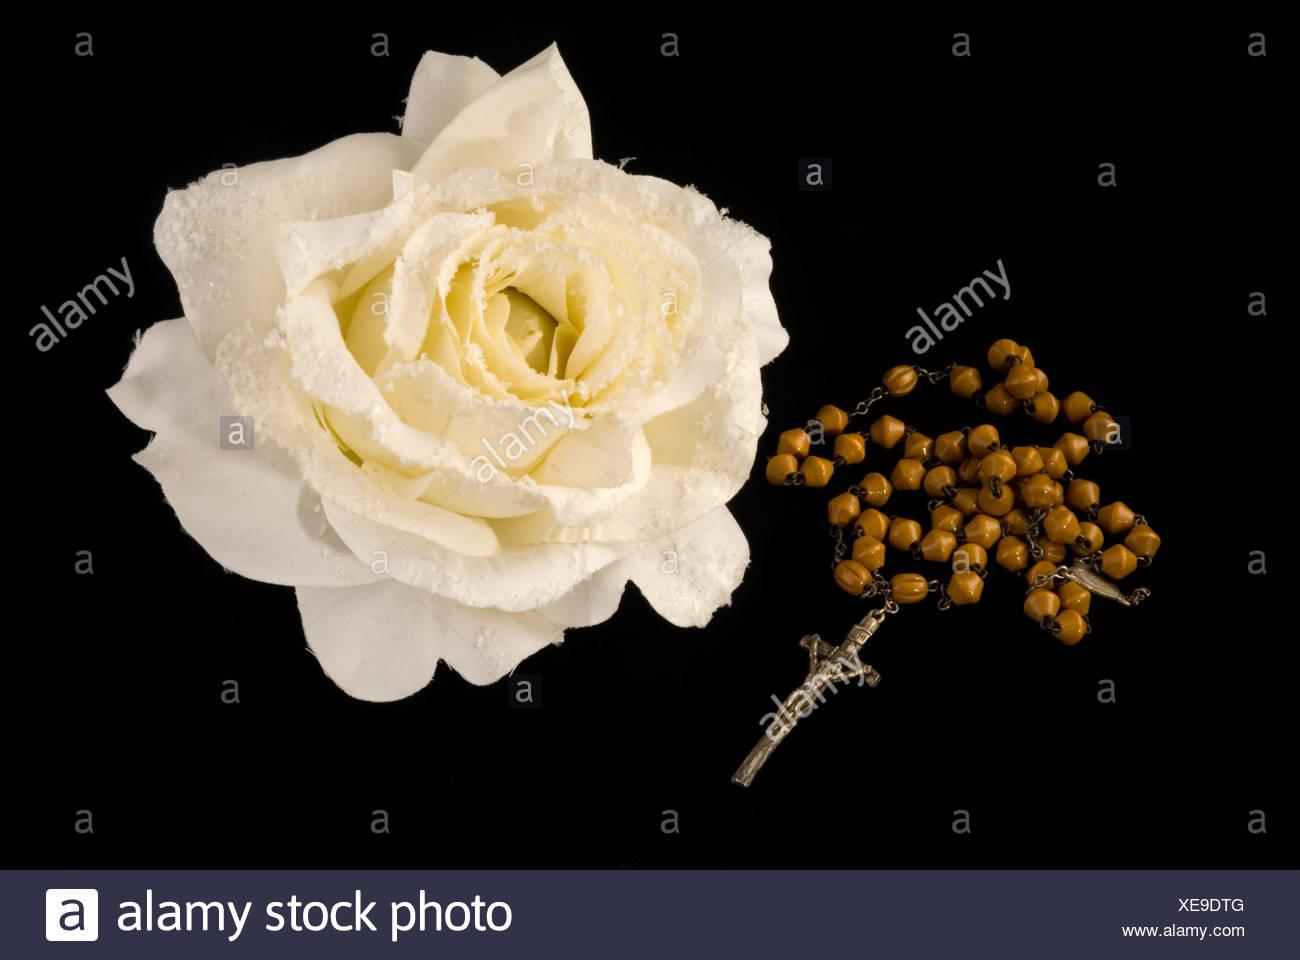 Rosary and rose stock photo 284179520 alamy rosary and rose izmirmasajfo